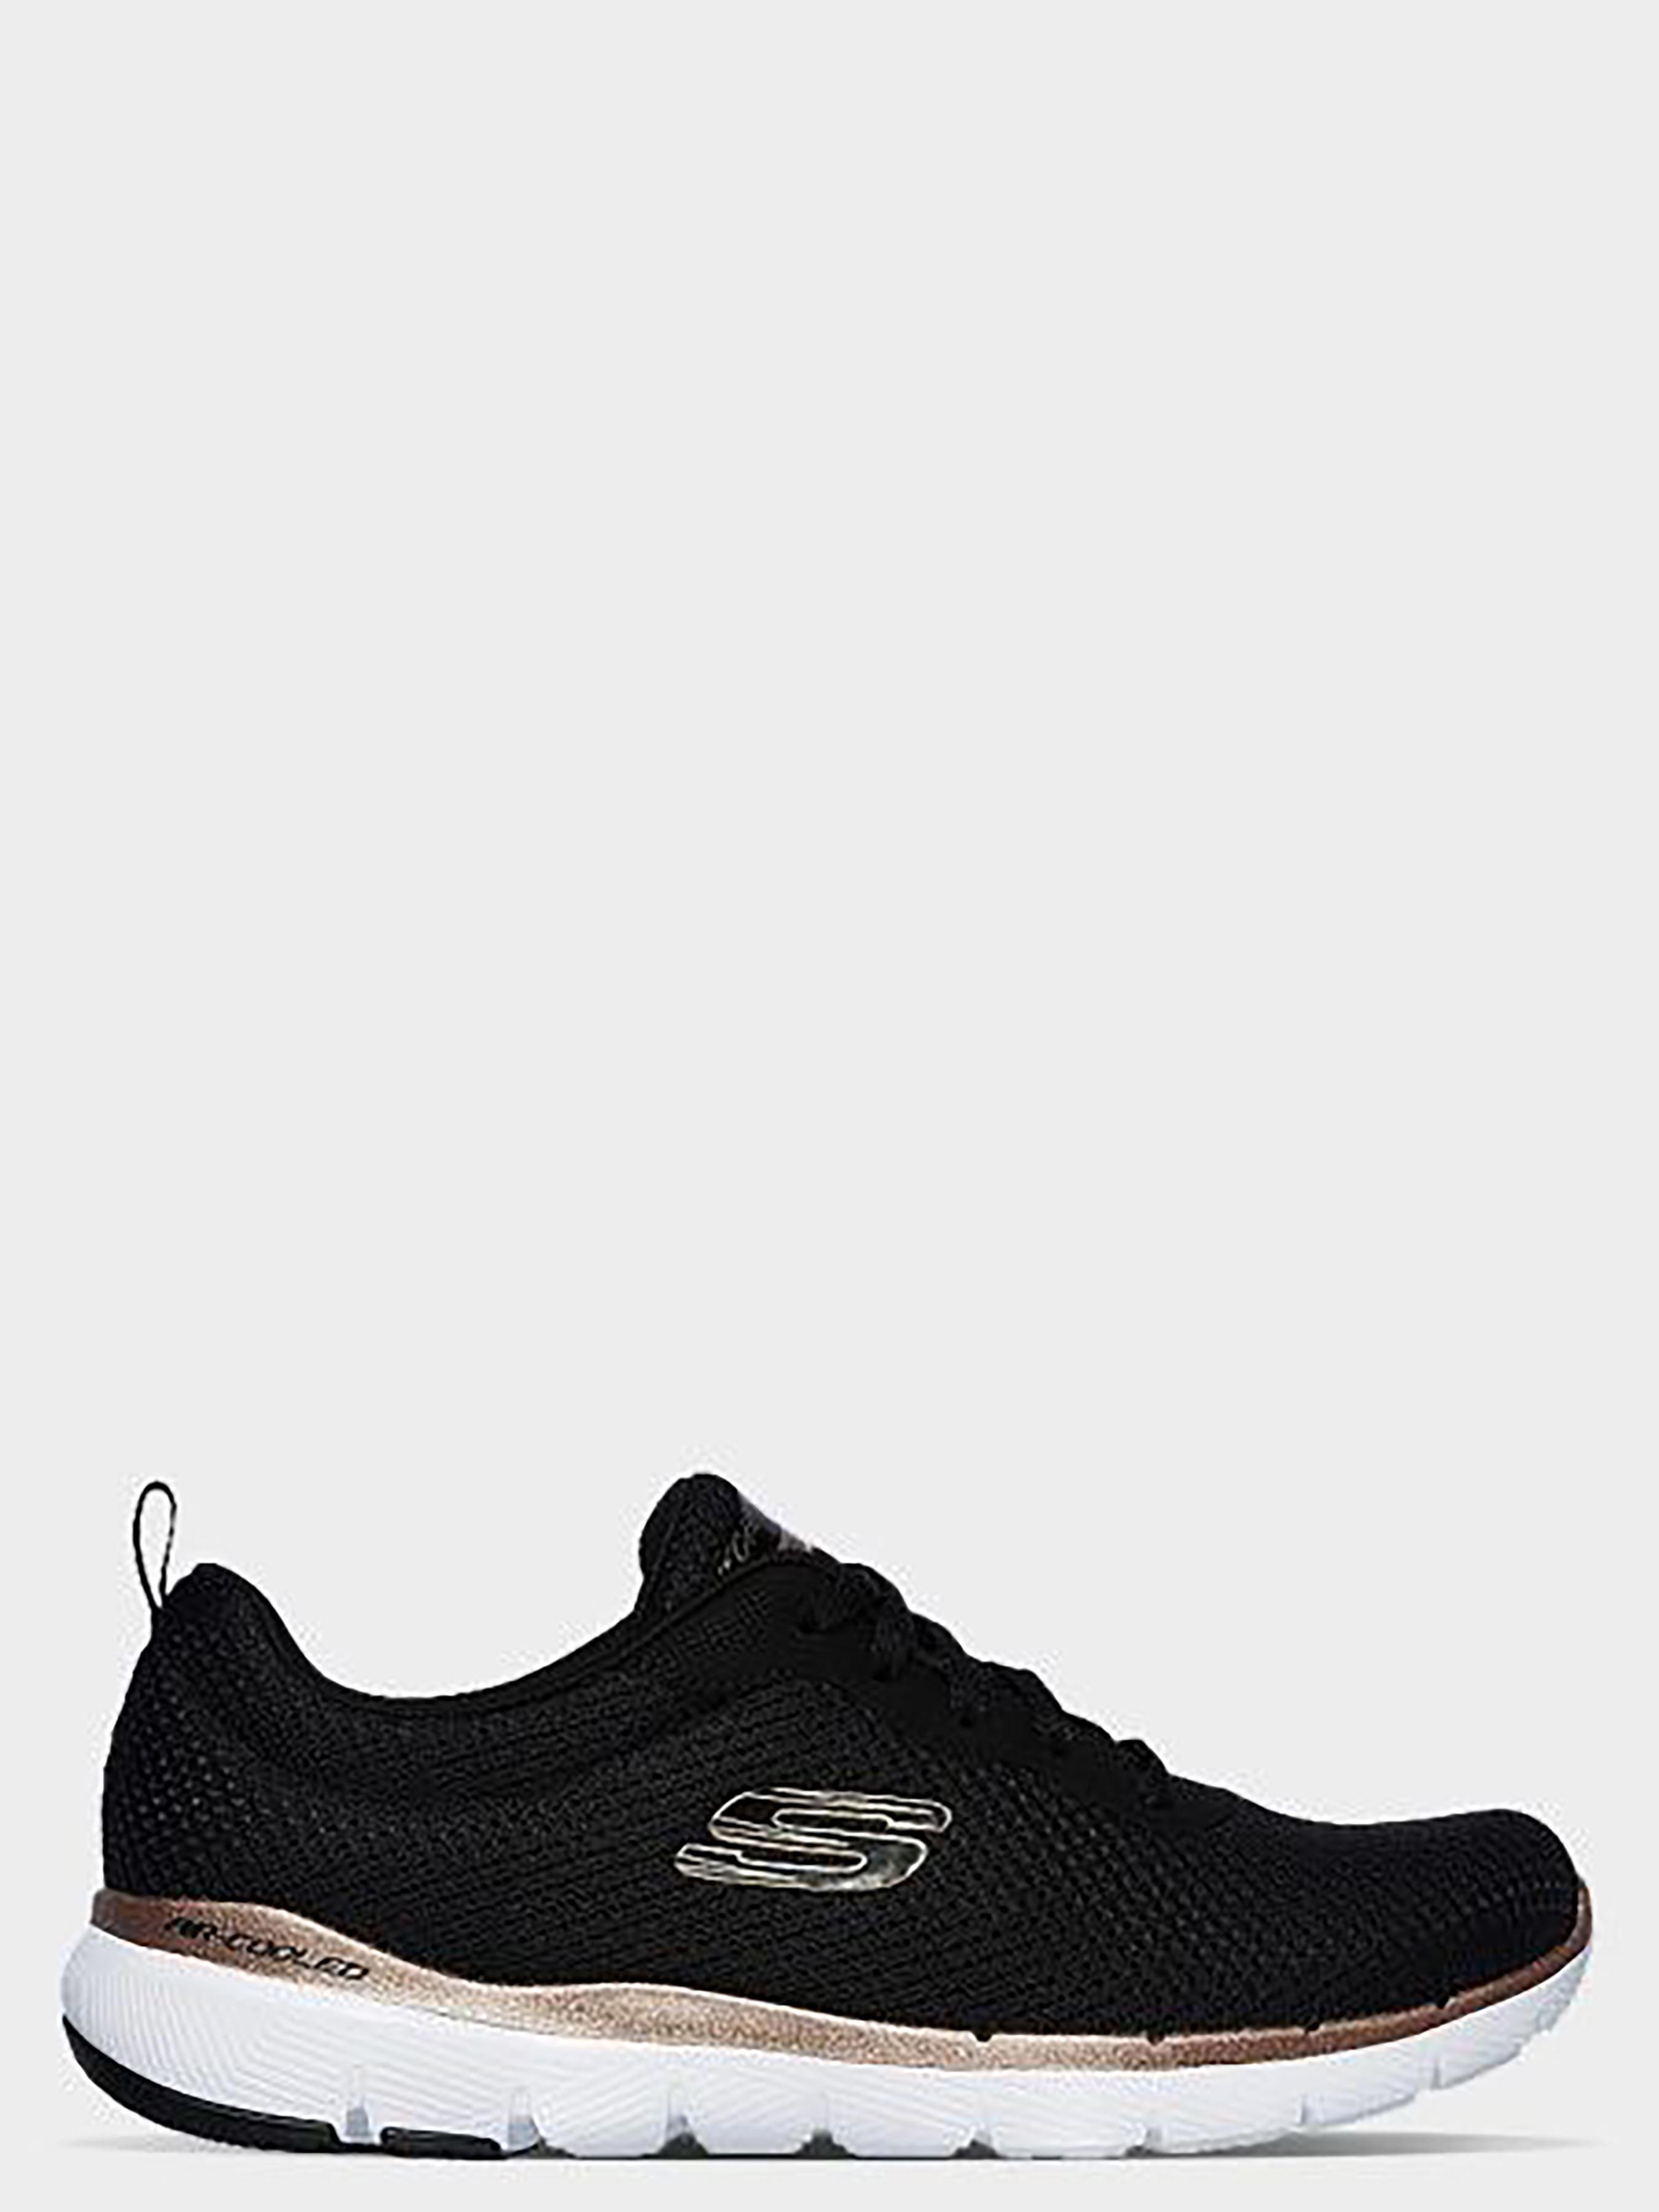 Кроссовки для женщин Skechers KW4735 продажа, 2017